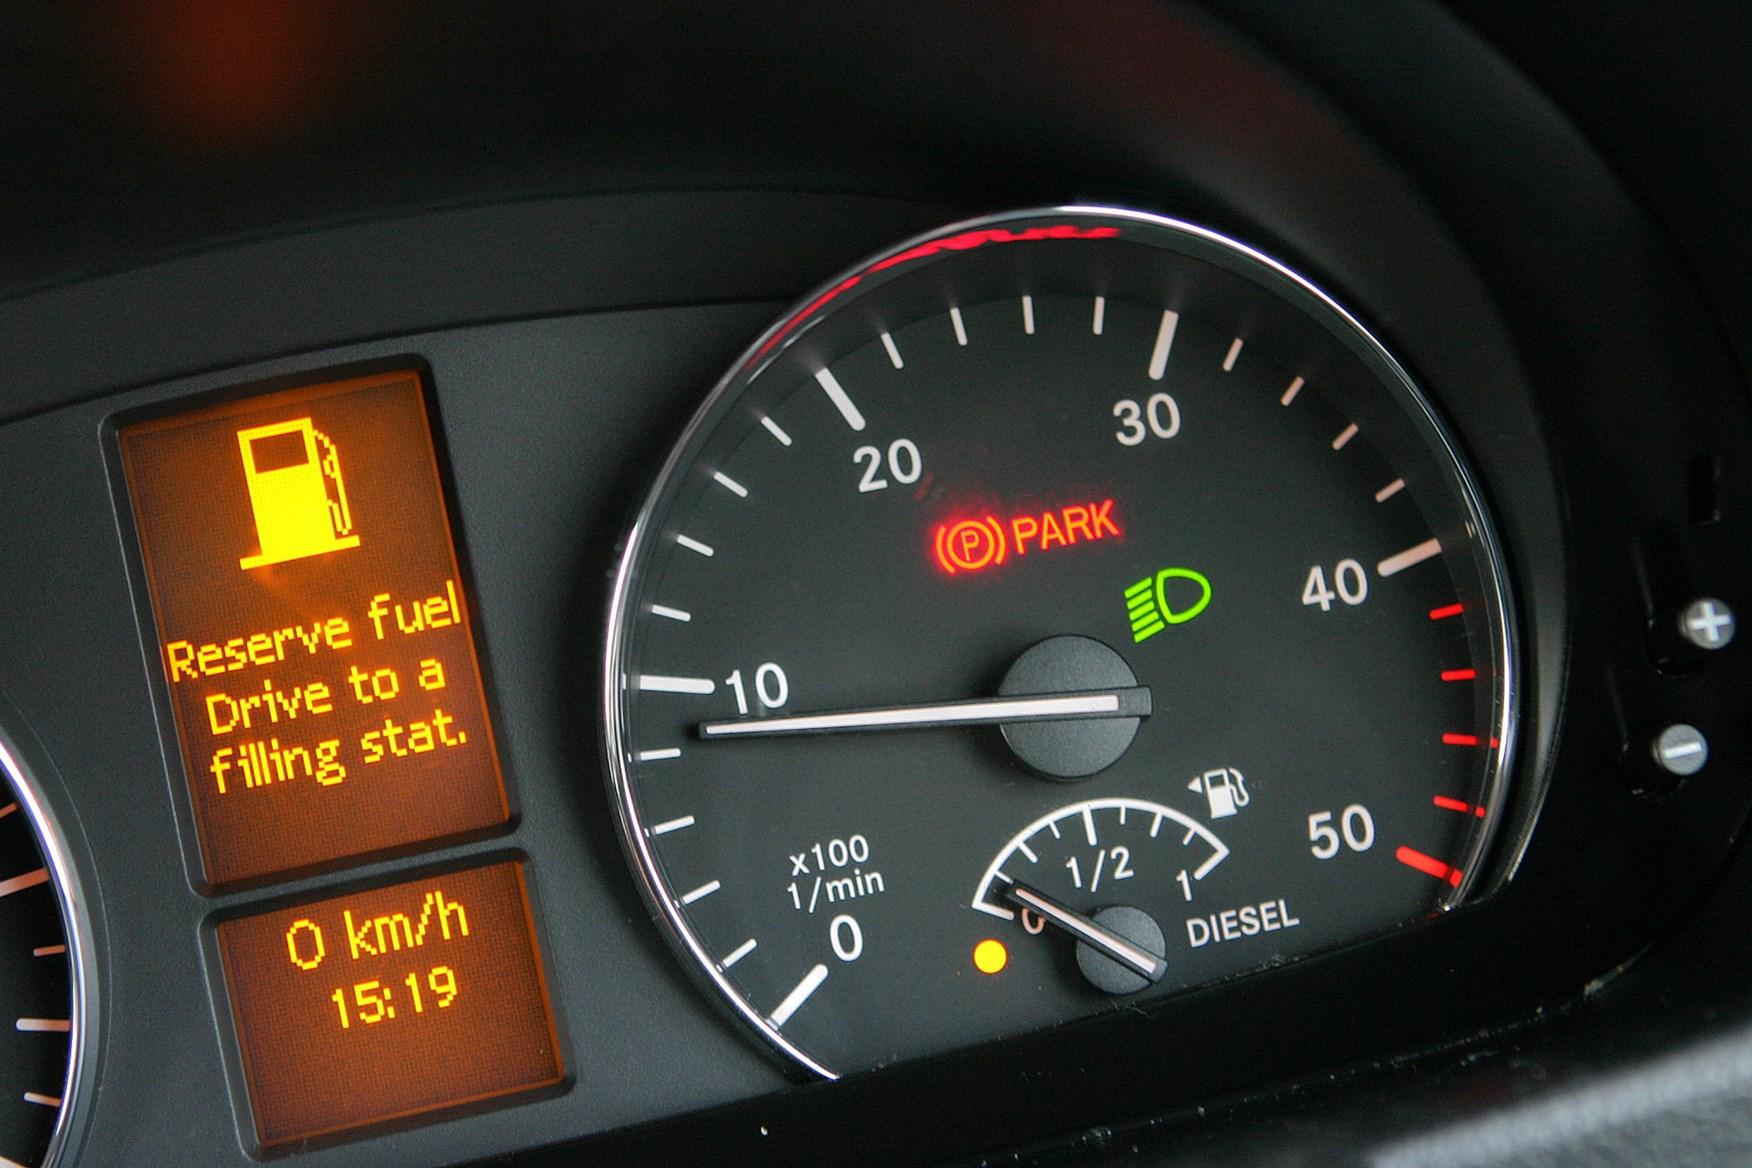 Mercedes-Benz Sprinter 2006-2013 review on Parkers Vans - dashboard detail